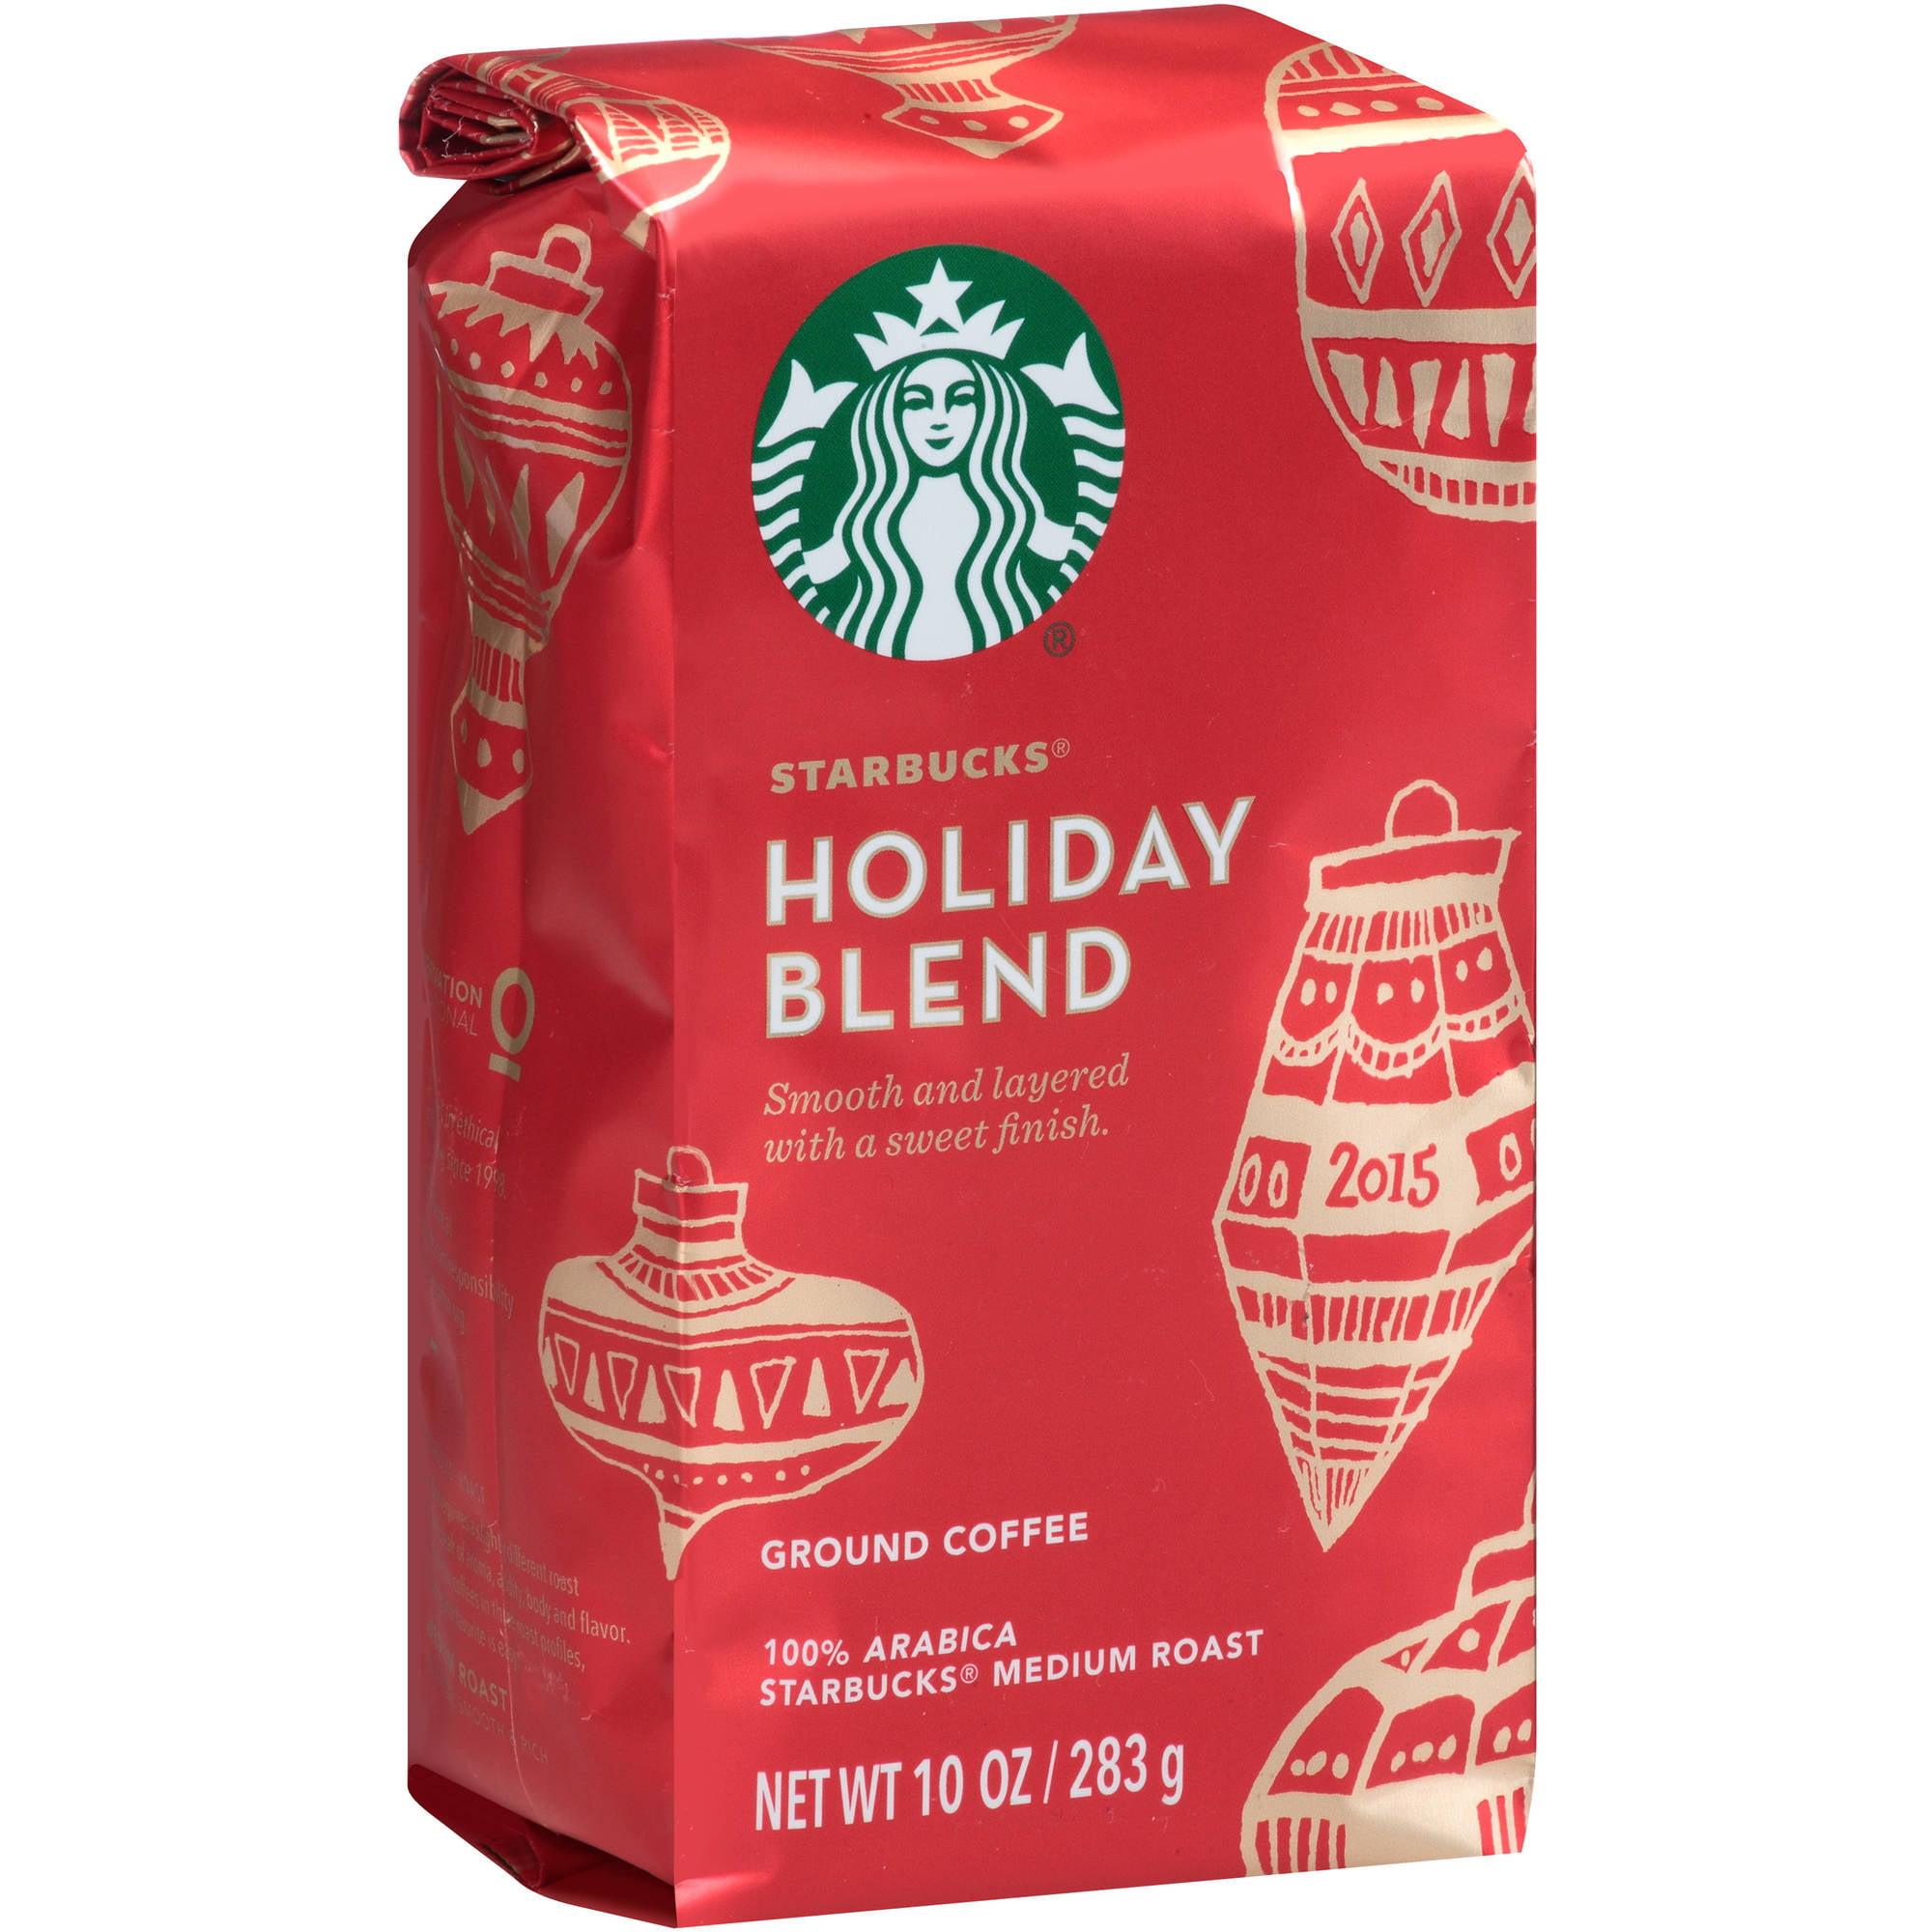 Starbucks Holiday Blend Medium Roast Ground Coffee, 10 oz